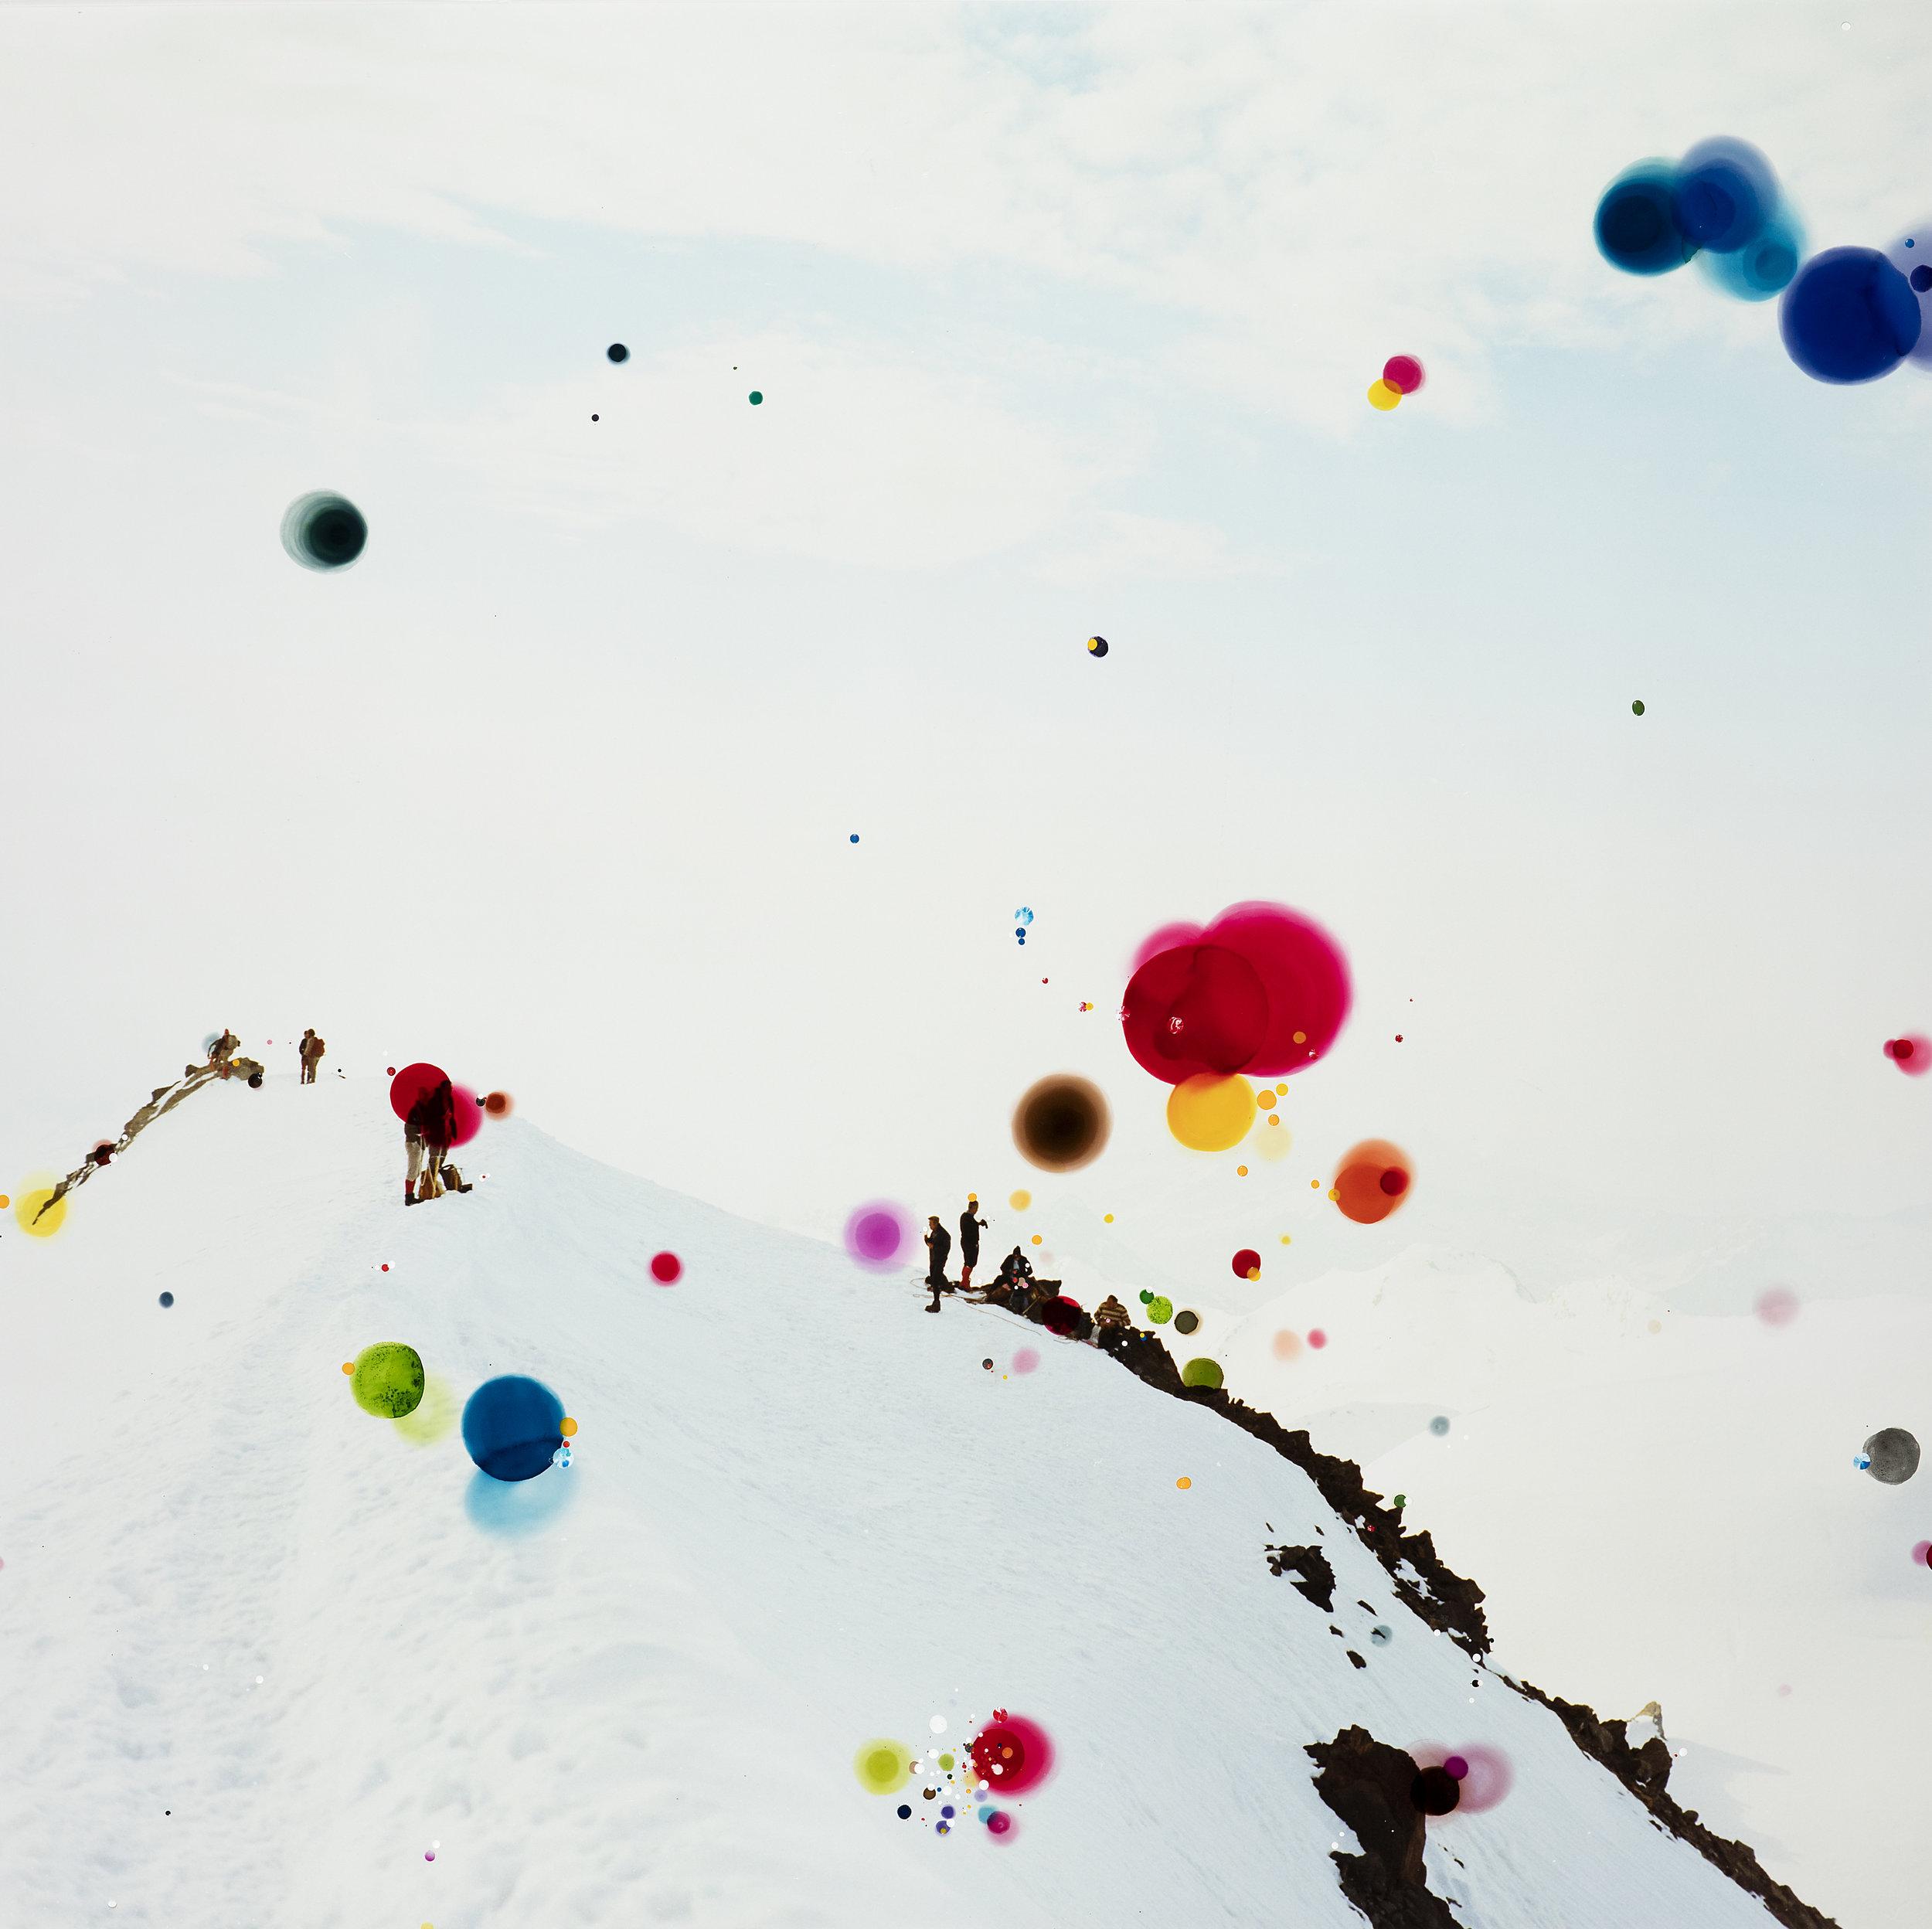 Large Schoener Gotterfunken XXIX - On their courses through the heavens (Durch des Himmels prachtigen Plan)